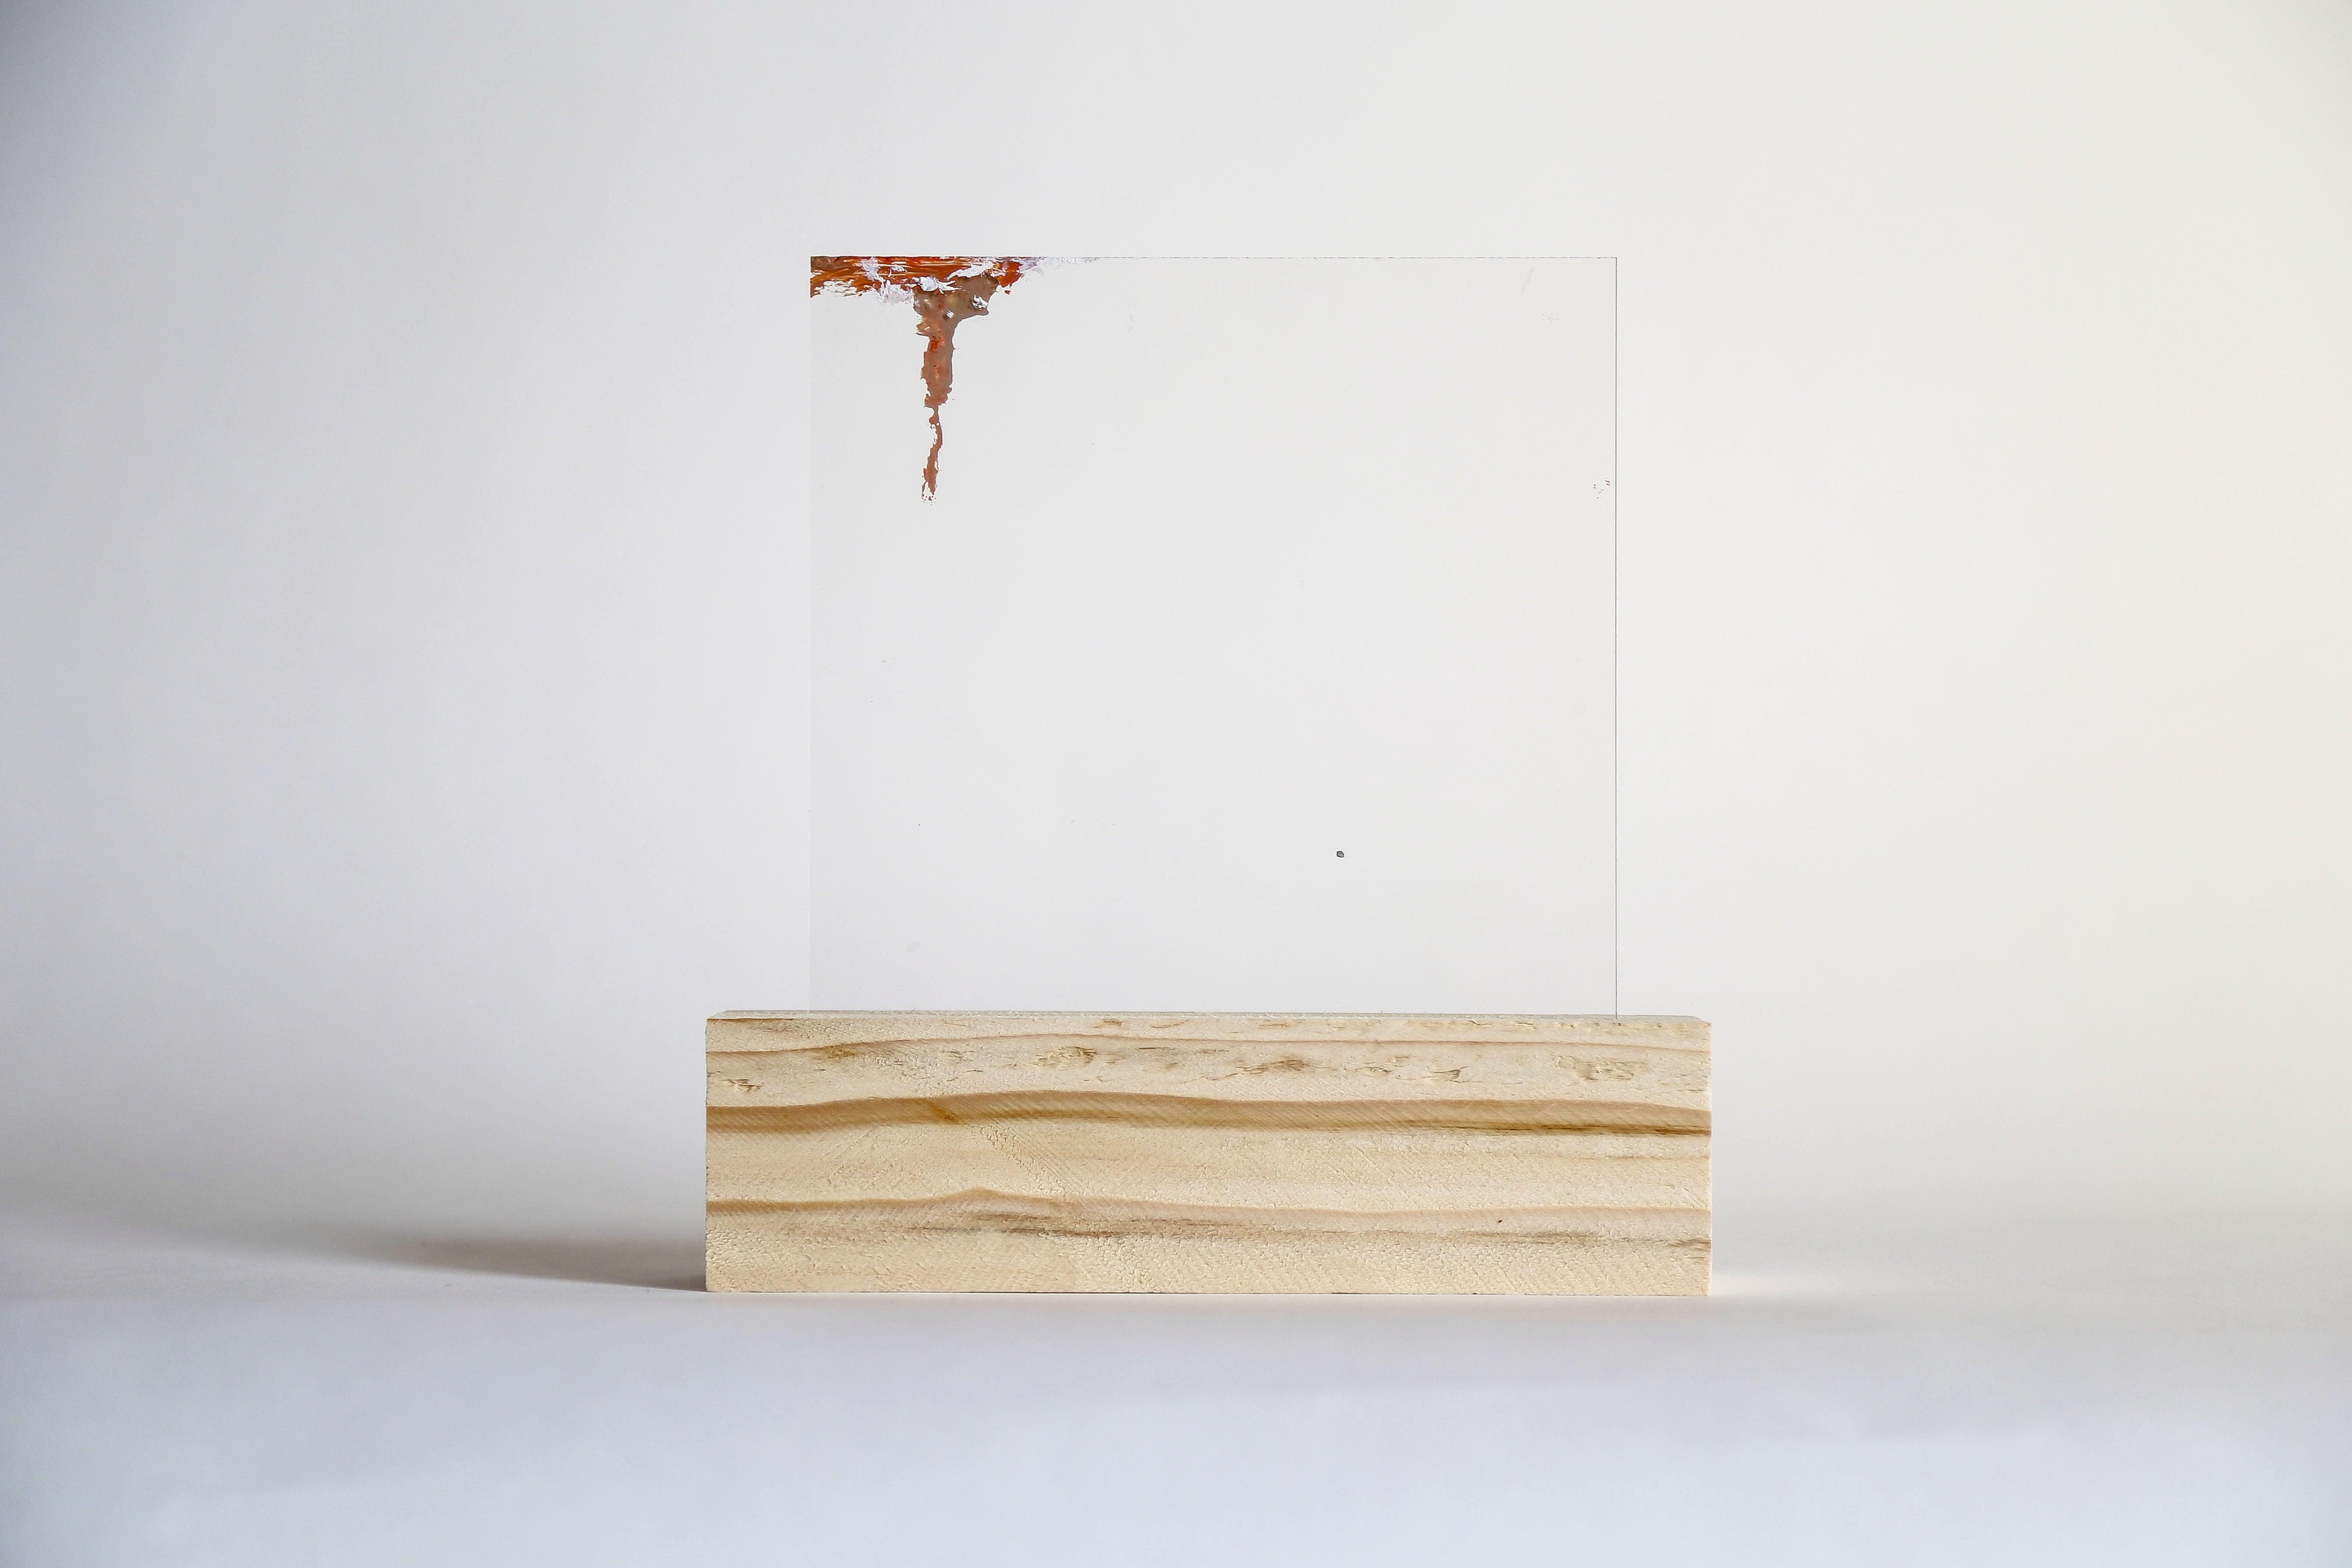 Lourdes Rivera, Retrospect 8, 2015, Plexiglass, Wood, Oil Paint